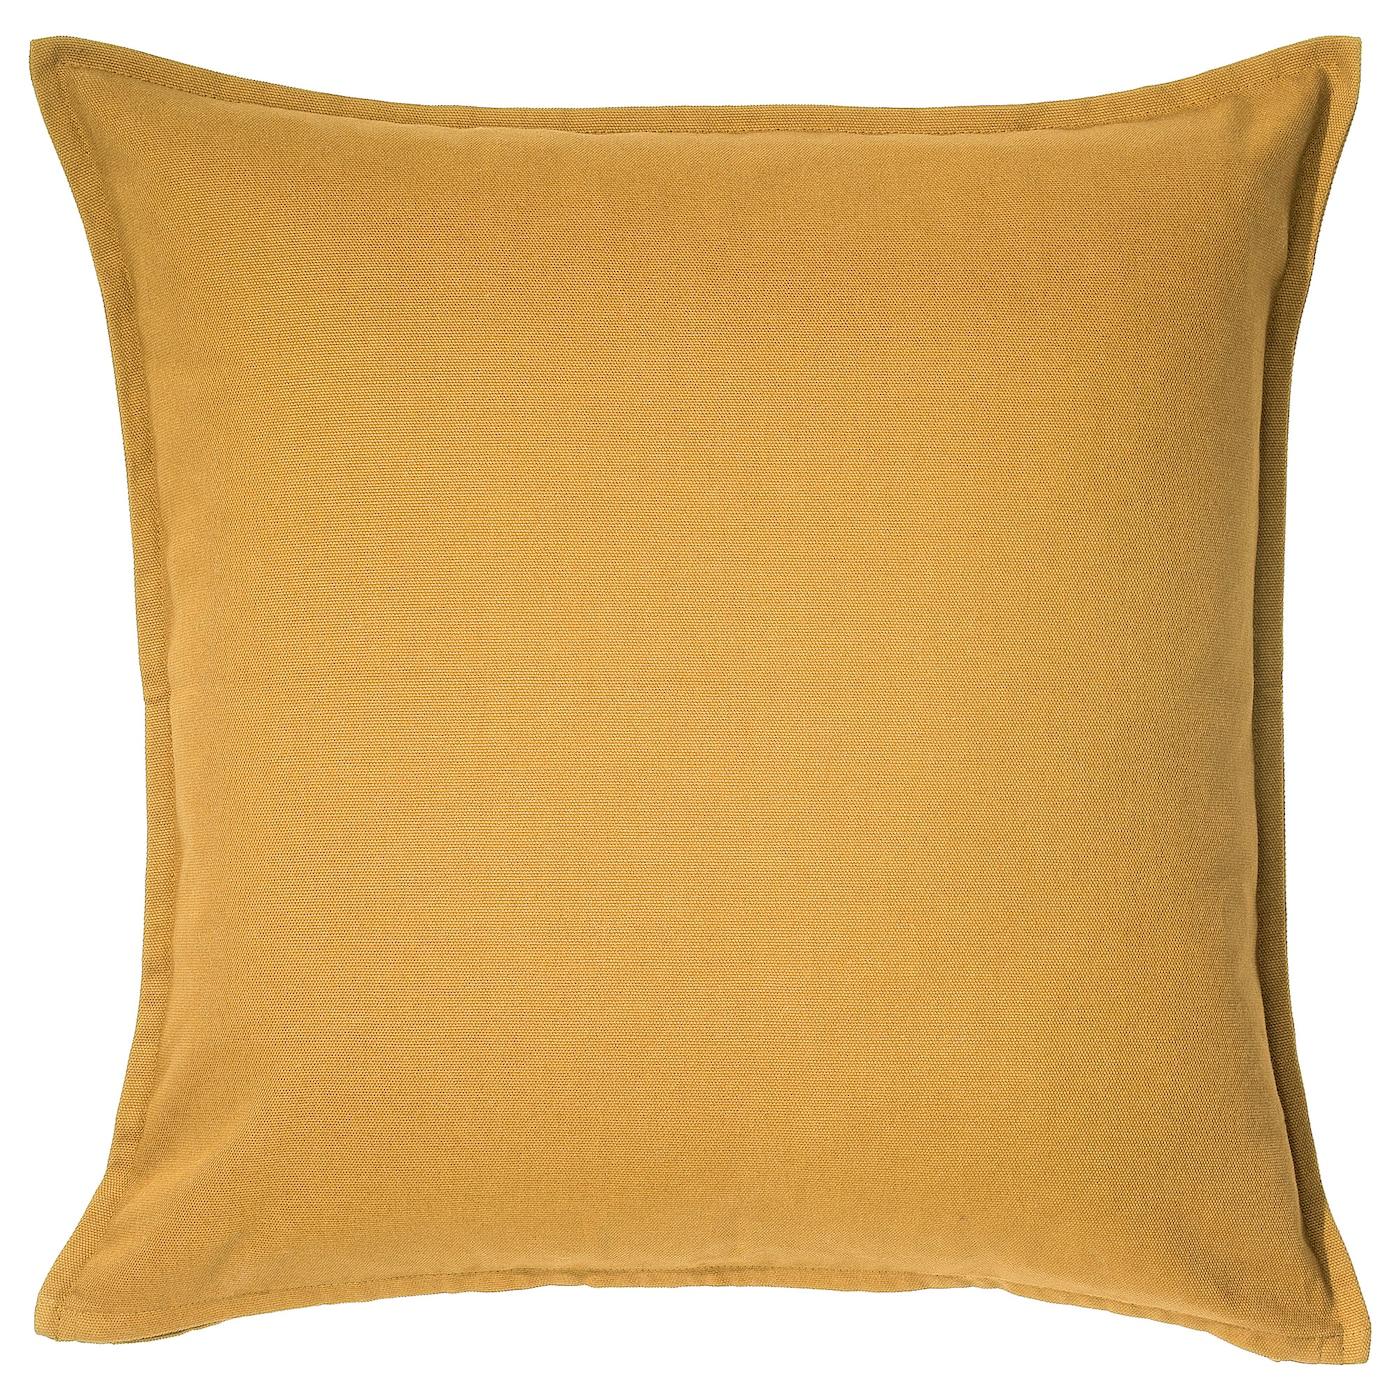 gurli cushion cover white 50 x 50 cm ikea. Black Bedroom Furniture Sets. Home Design Ideas